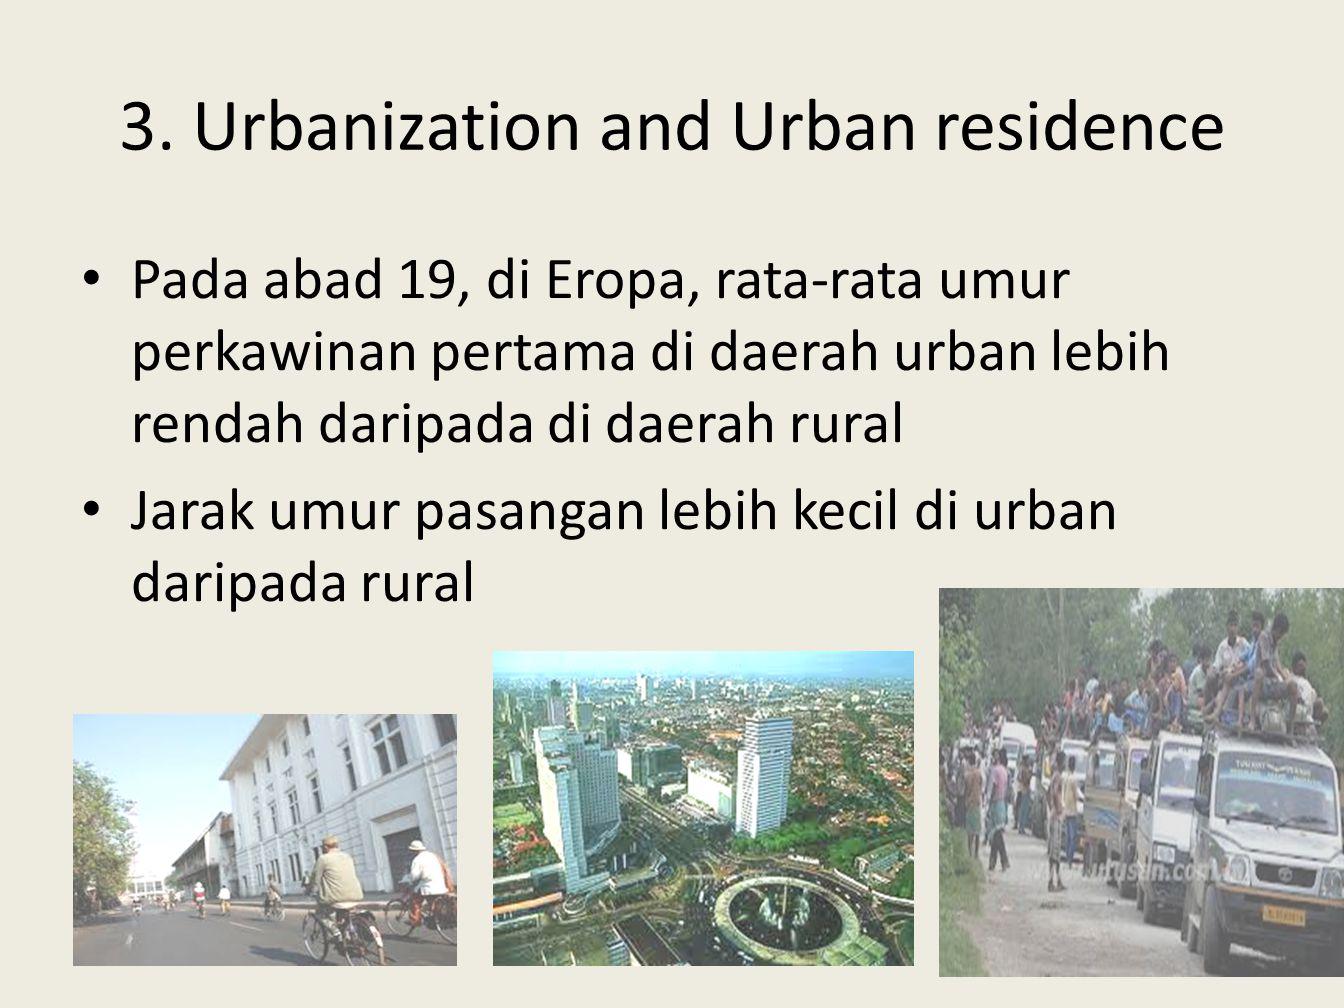 3. Urbanization and Urban residence • Pada abad 19, di Eropa, rata-rata umur perkawinan pertama di daerah urban lebih rendah daripada di daerah rural